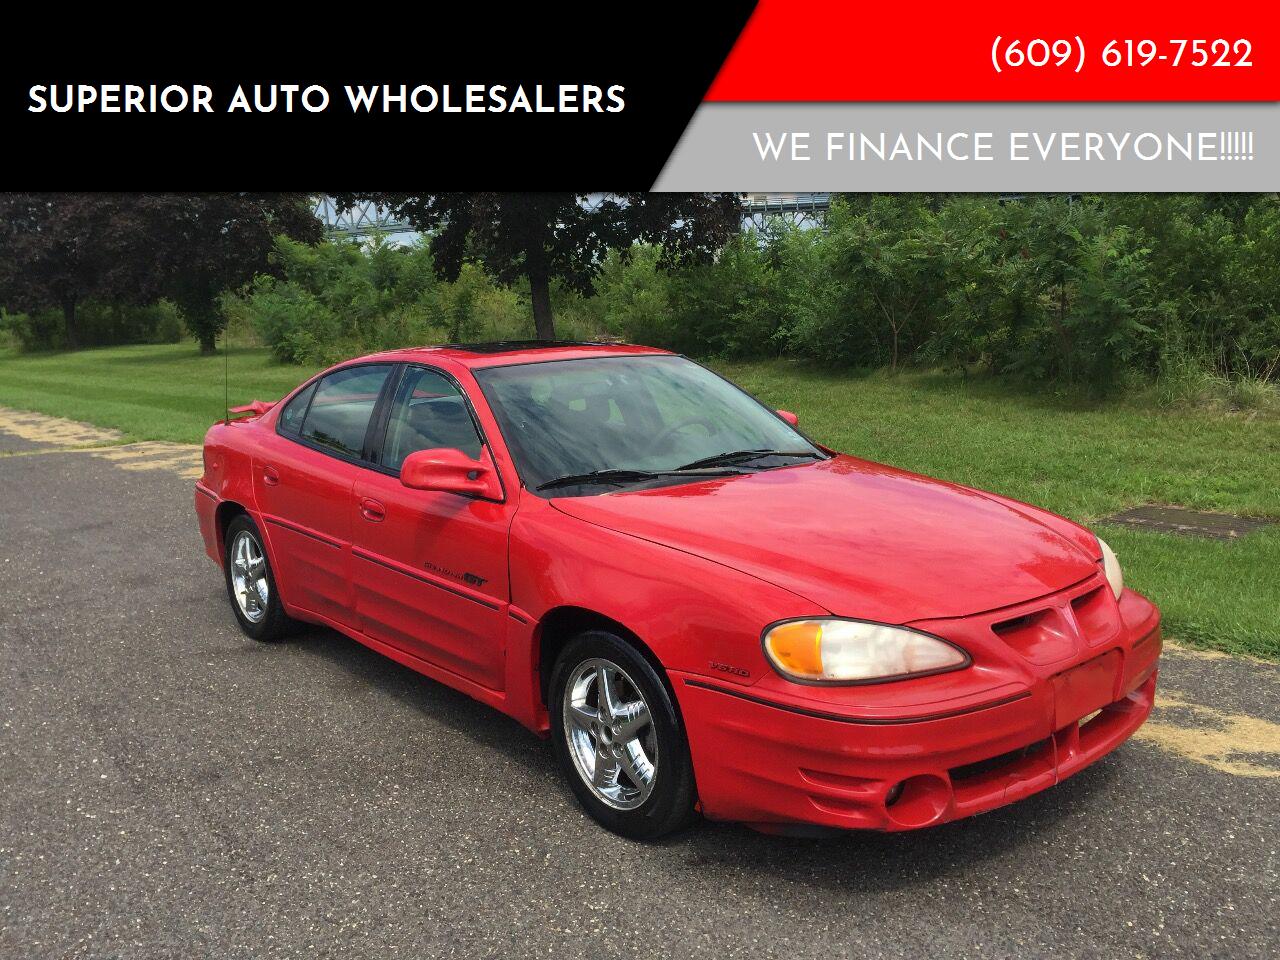 used 1999 pontiac grand am for sale carsforsale com used 1999 pontiac grand am for sale